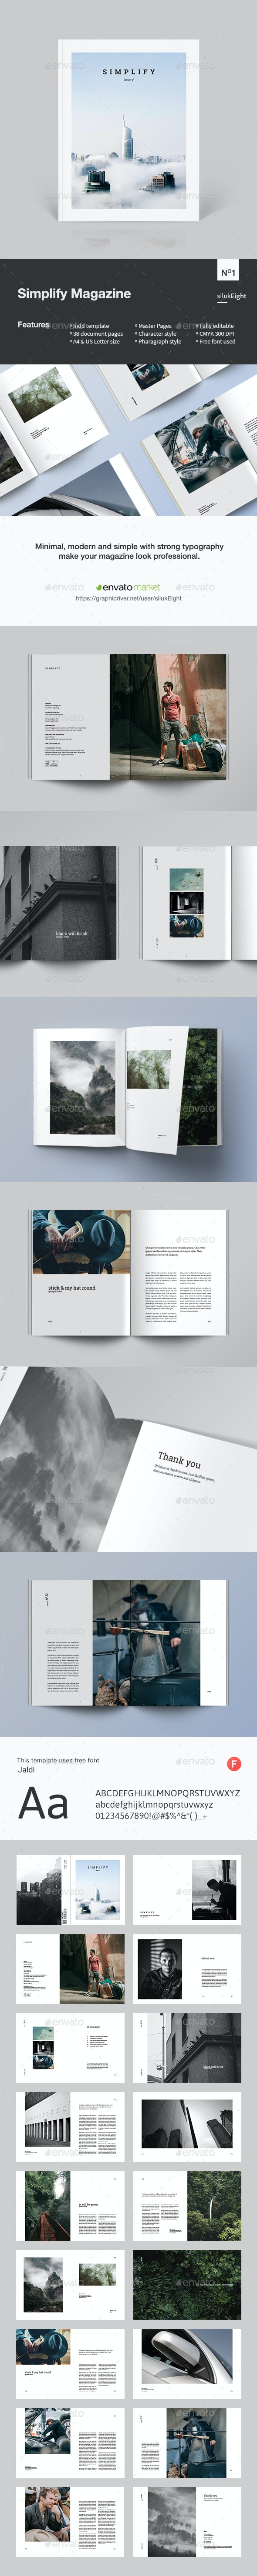 Simplify Magazine - Magazines Print Templates